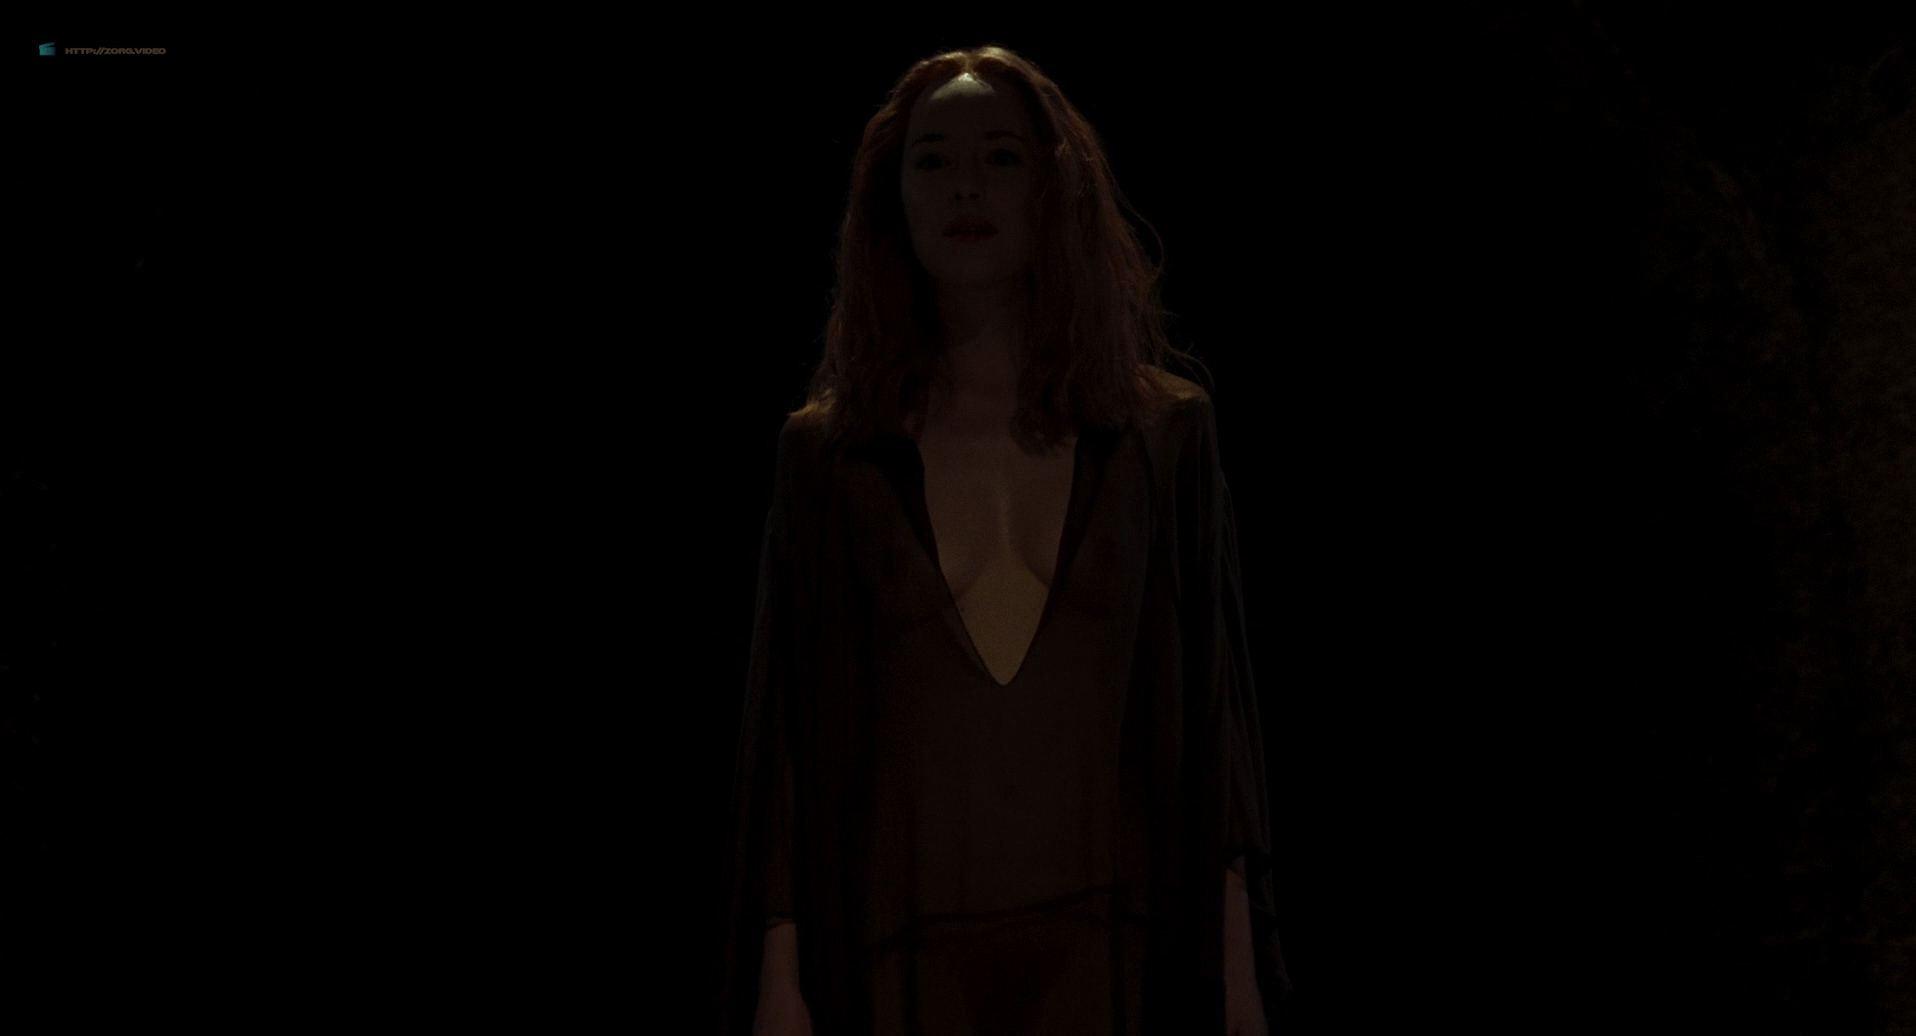 0013033402464_13_Dakota-Johnson-hot-c-true-Mia-Goth-nude-full-frontal-others-nude-too-Suspiria-2018-HD-1080p-04.jpg